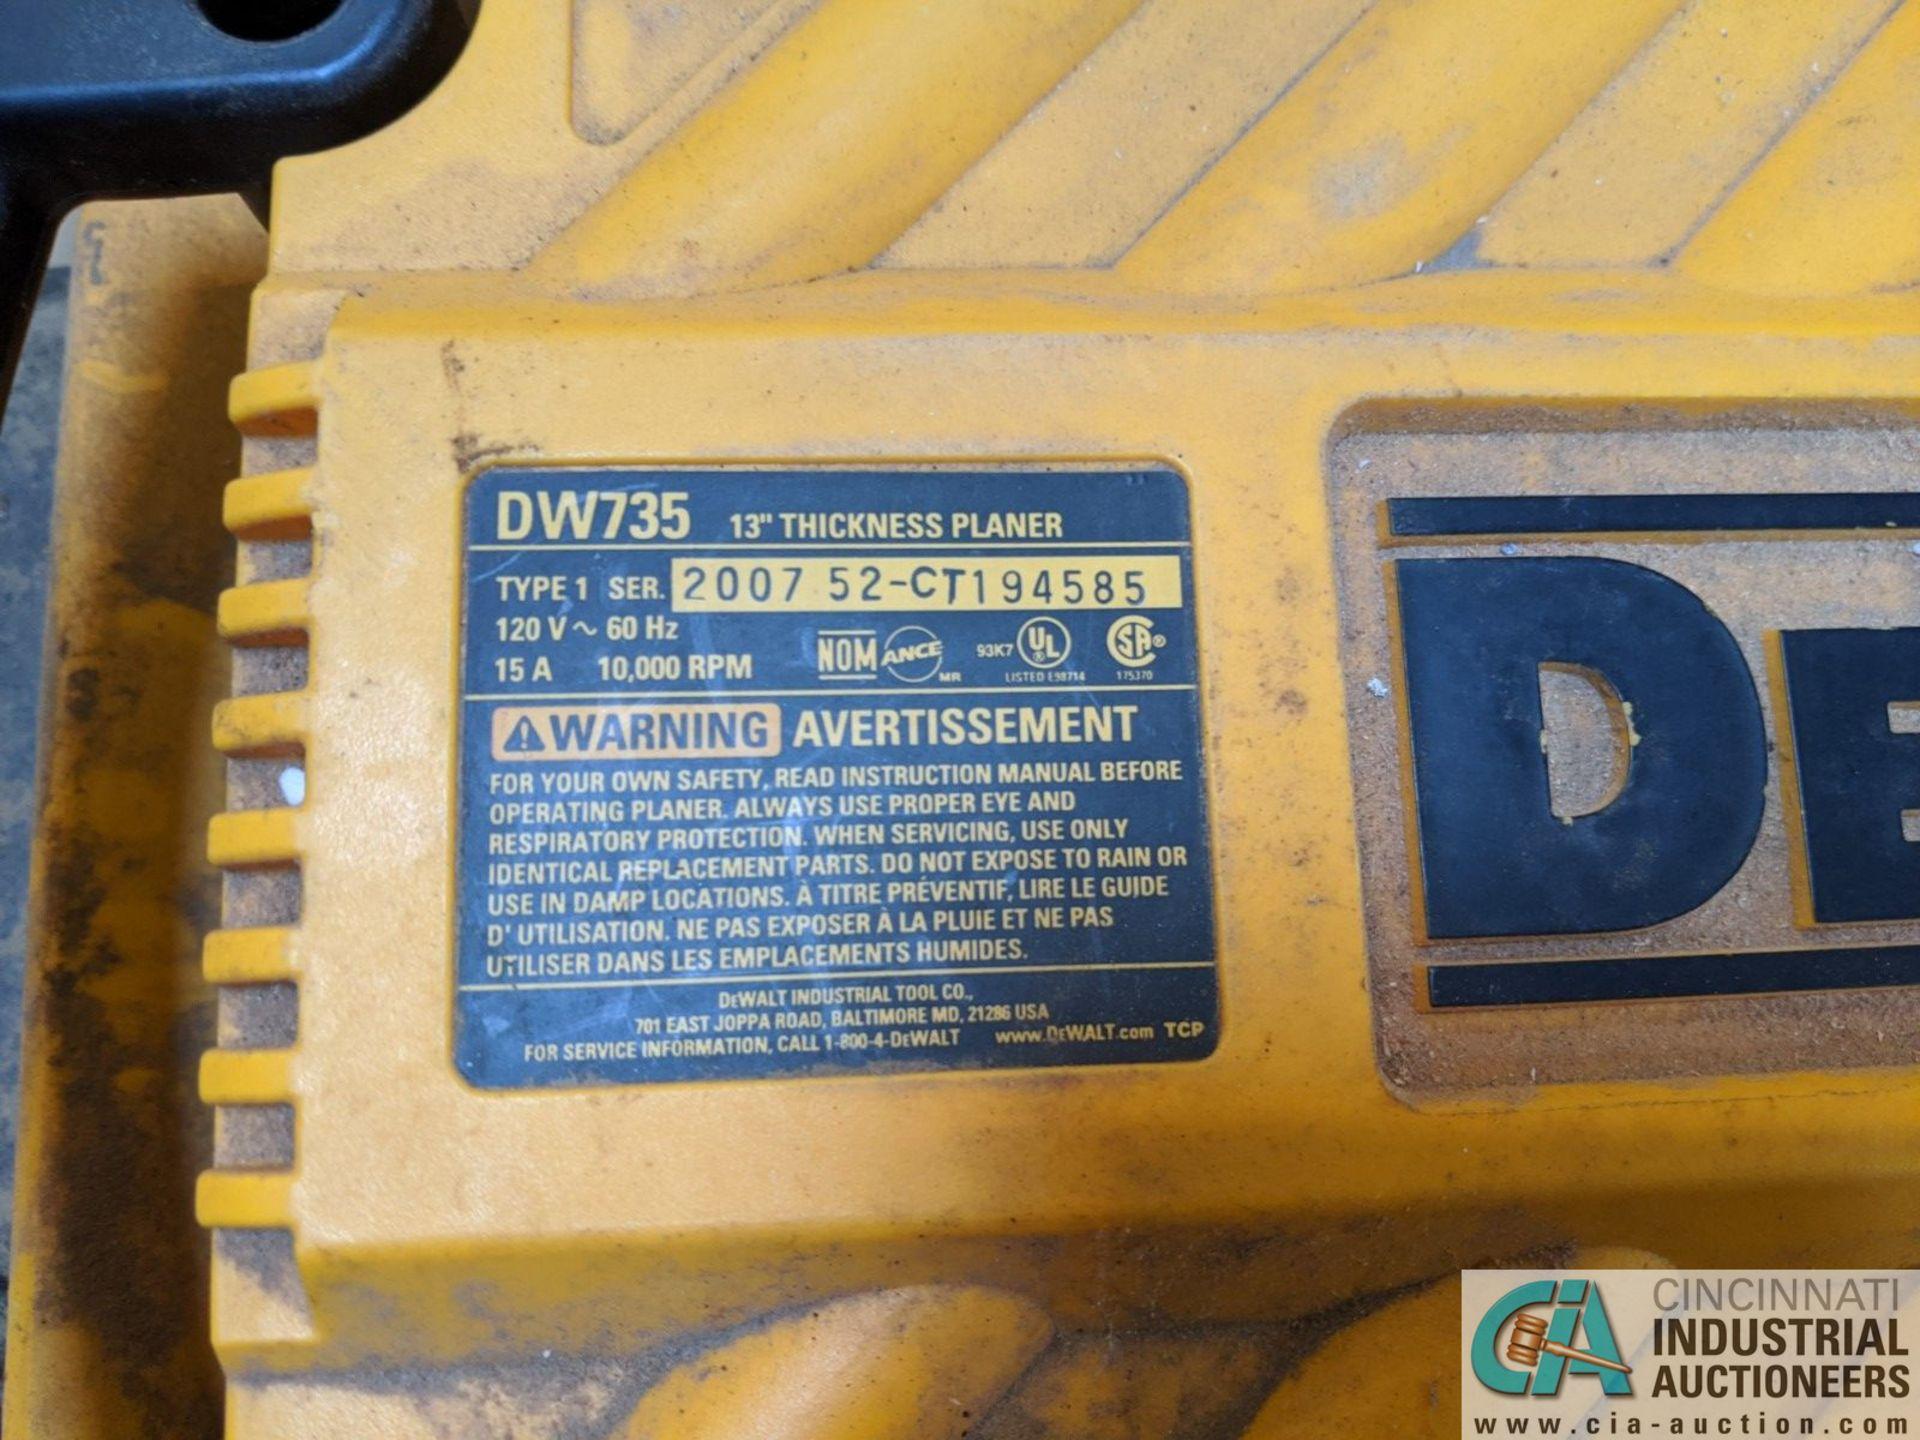 "13"" THICKNESS DEWALT MODEL DW735 PLANER; S/N 2007-52-CTI94585 (8635 East Ave., Mentor, OH 44060 - - Image 6 of 6"